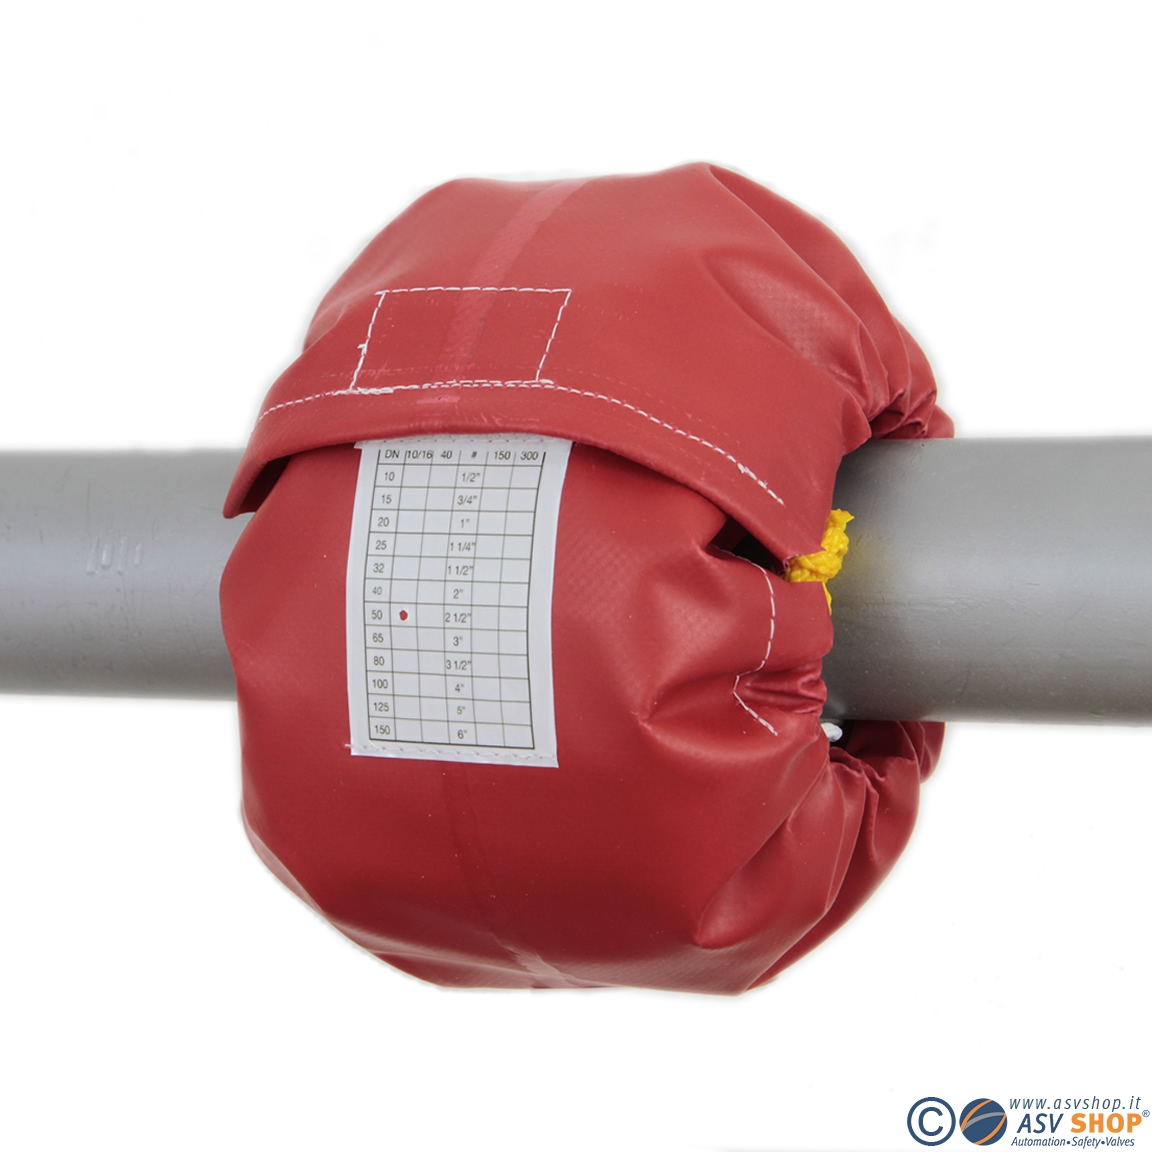 copriflange rosso per acido cloridrico e soda caustica